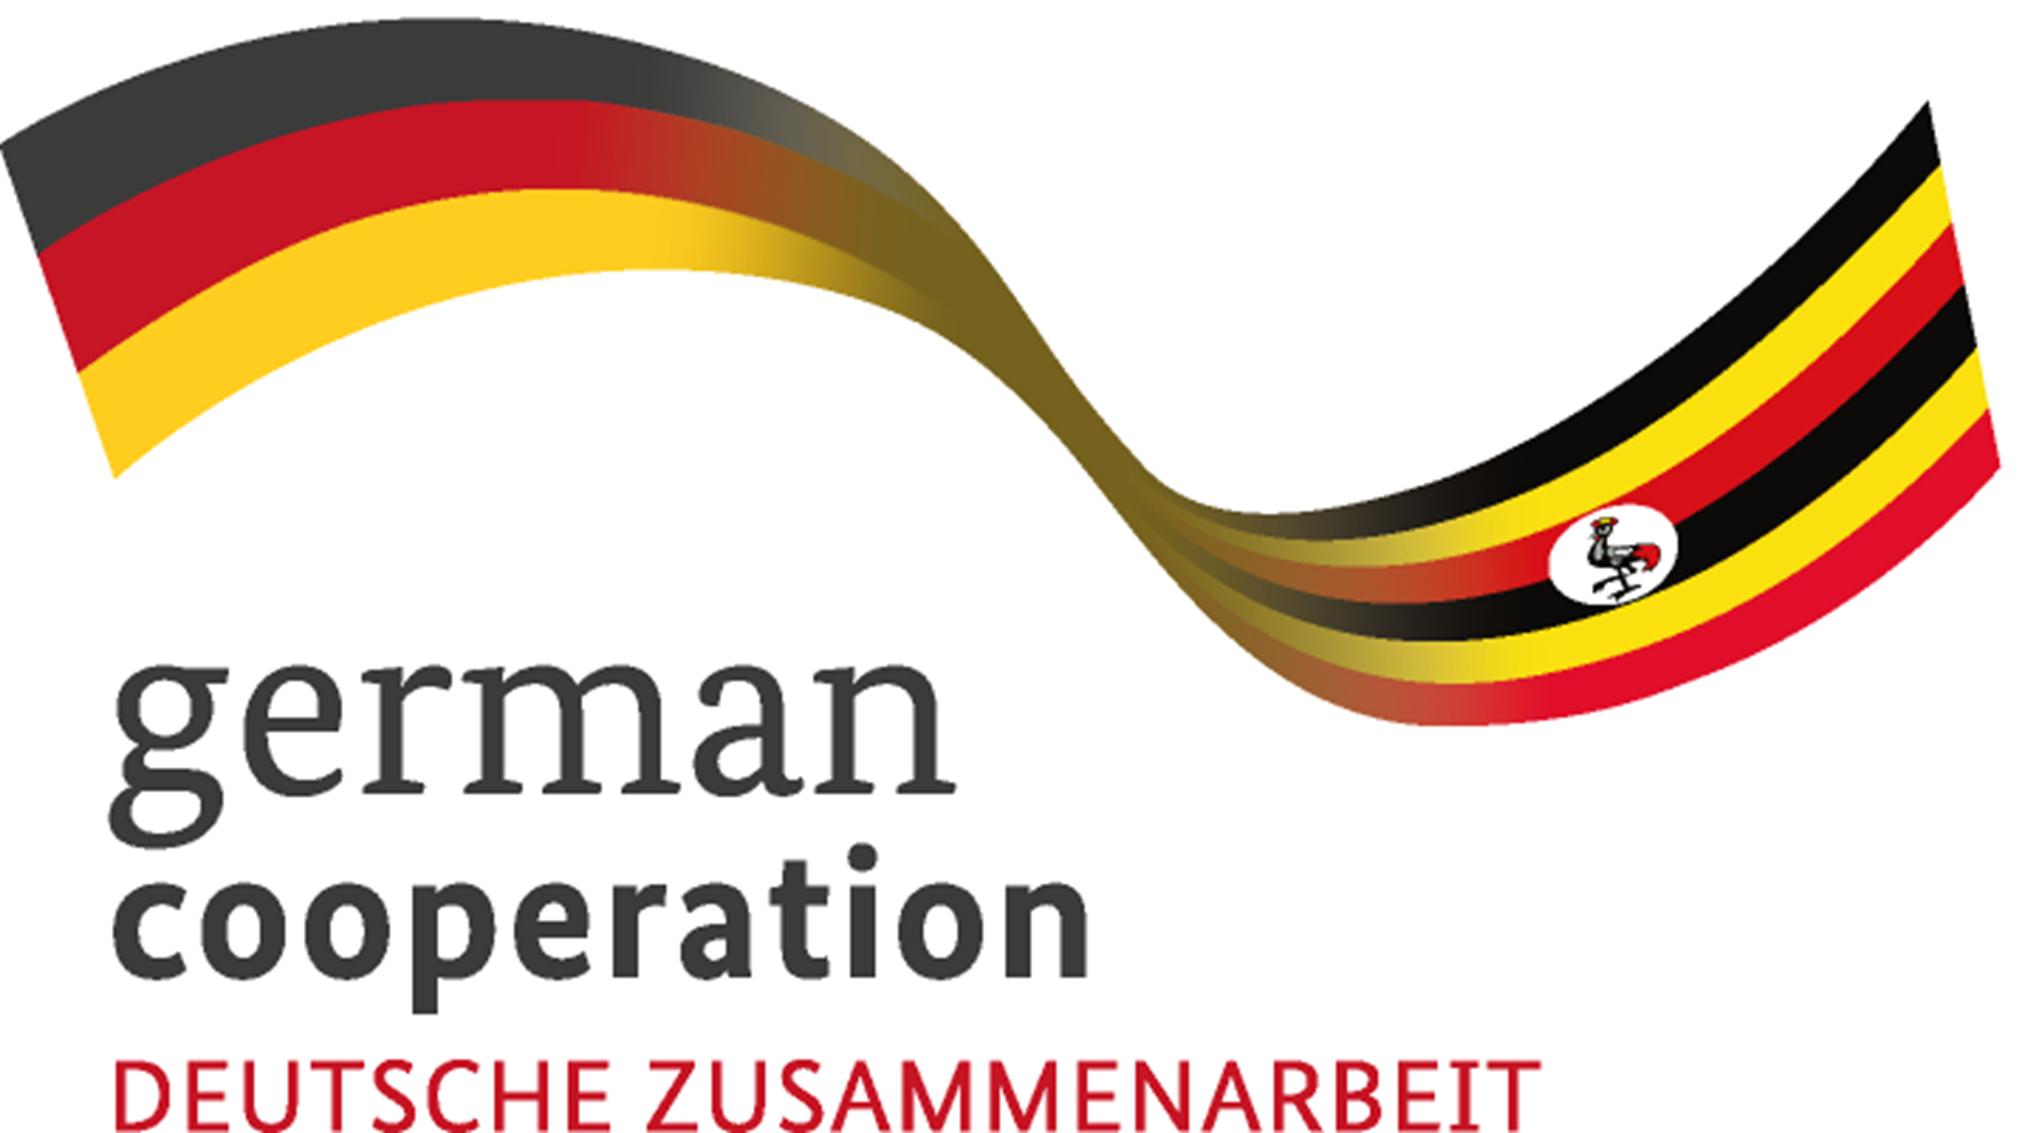 GIZ Cooperation